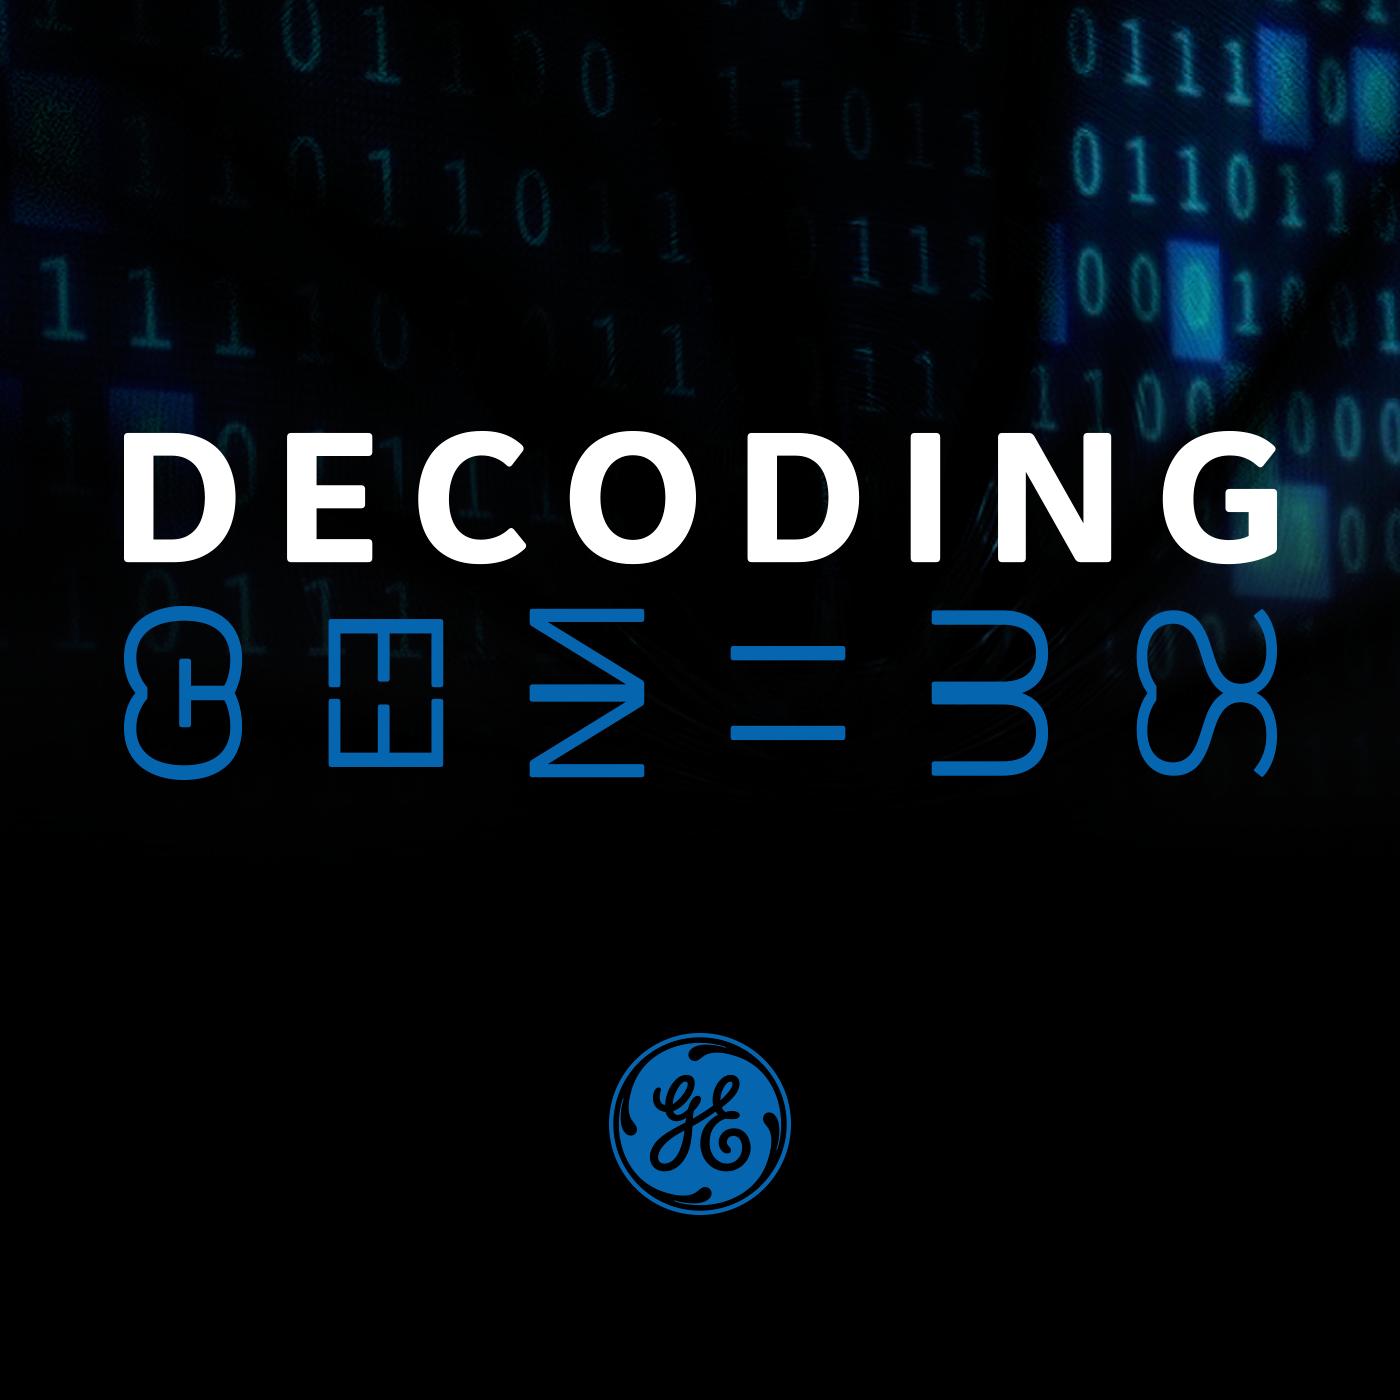 Decoding Genius - Whooshkaa